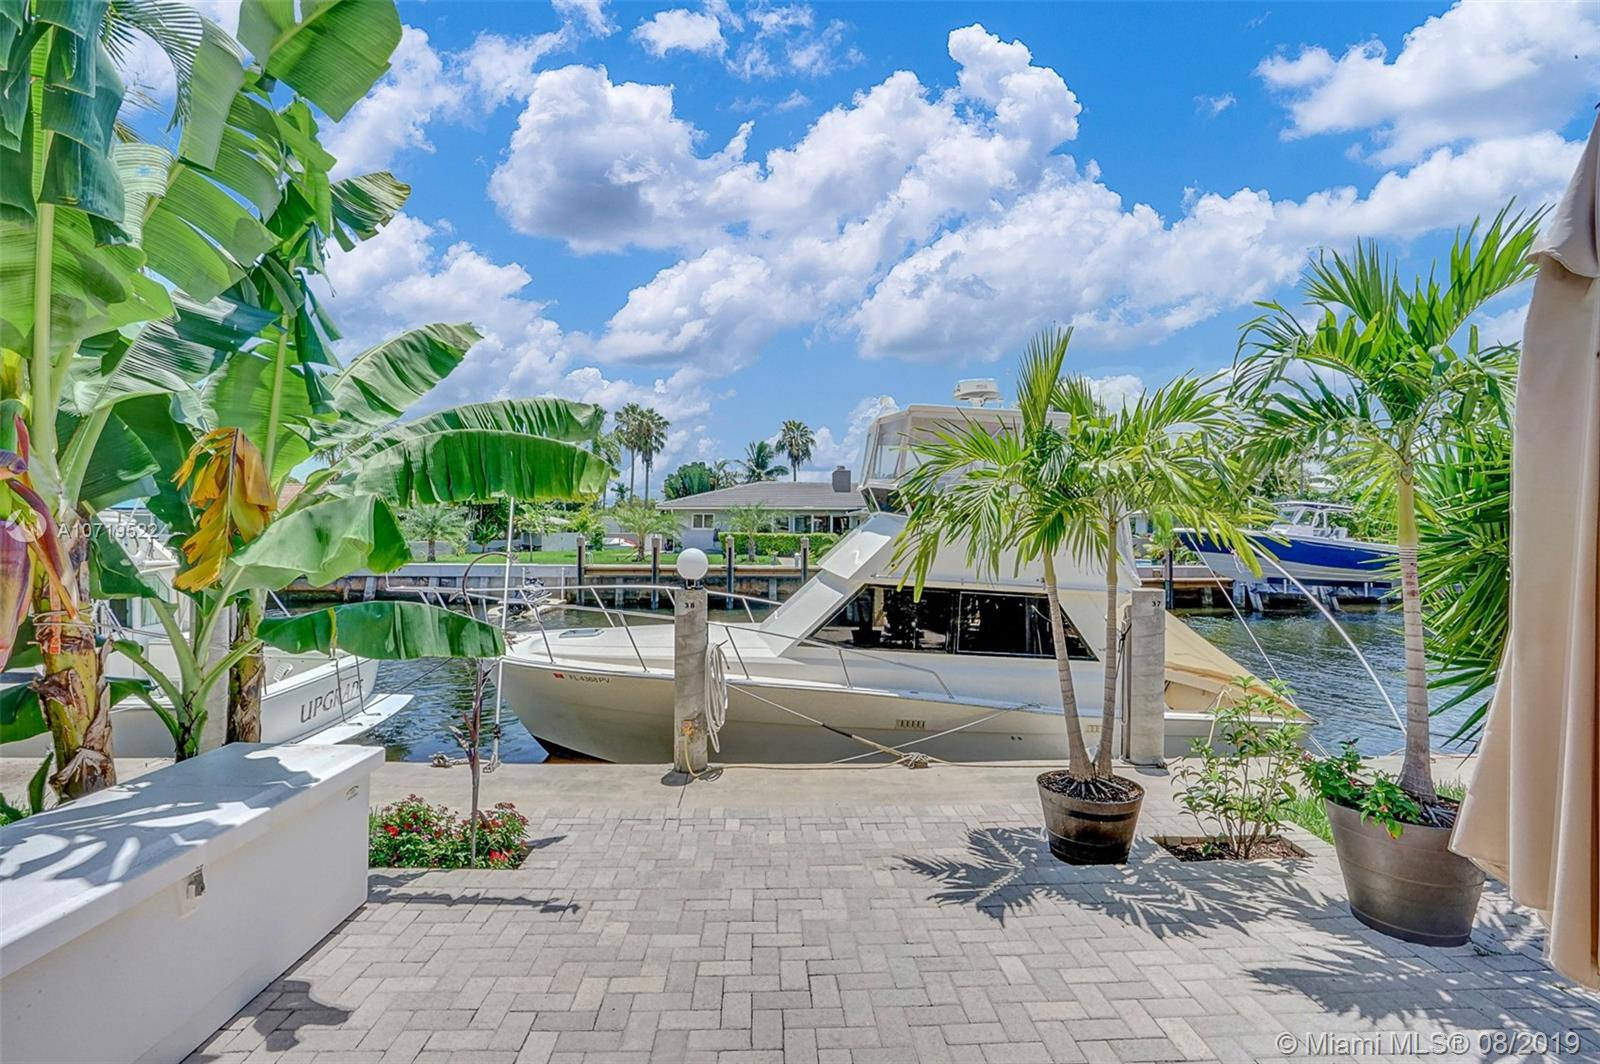 Miami Shores #B-12 - 06 - photo